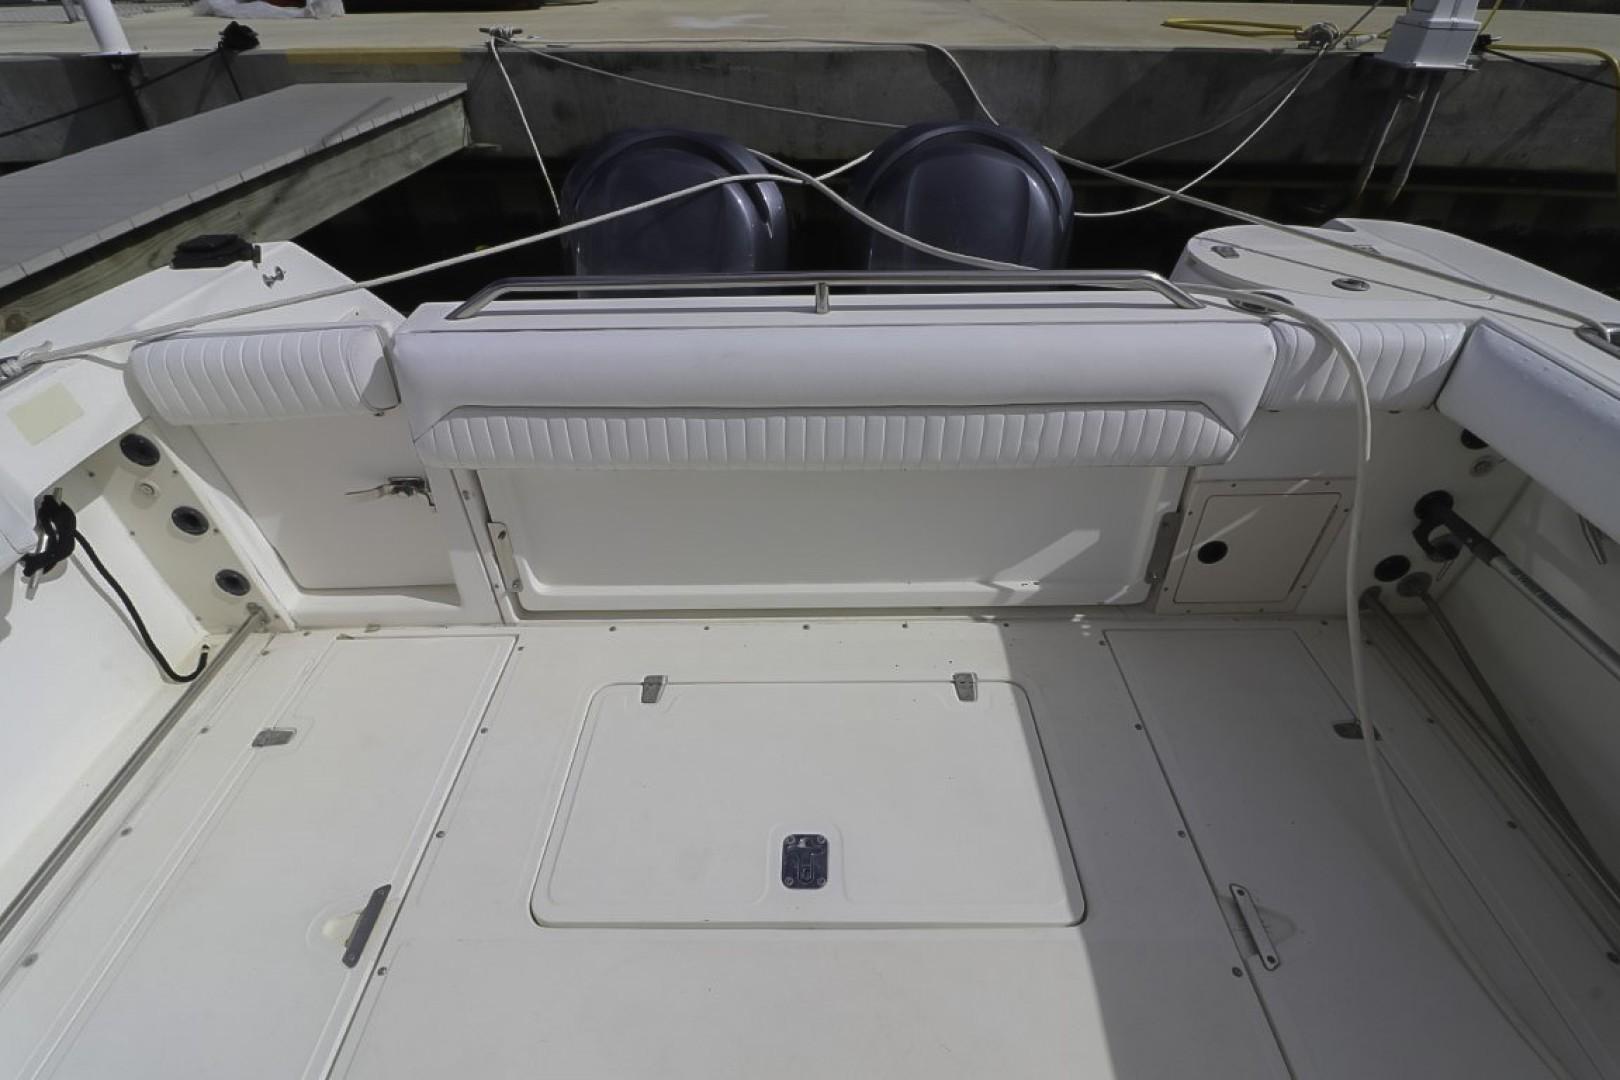 Boston Whaler-280 Outrage 2001 -Fort Lauderdale-Florida-United States-1566076 | Thumbnail